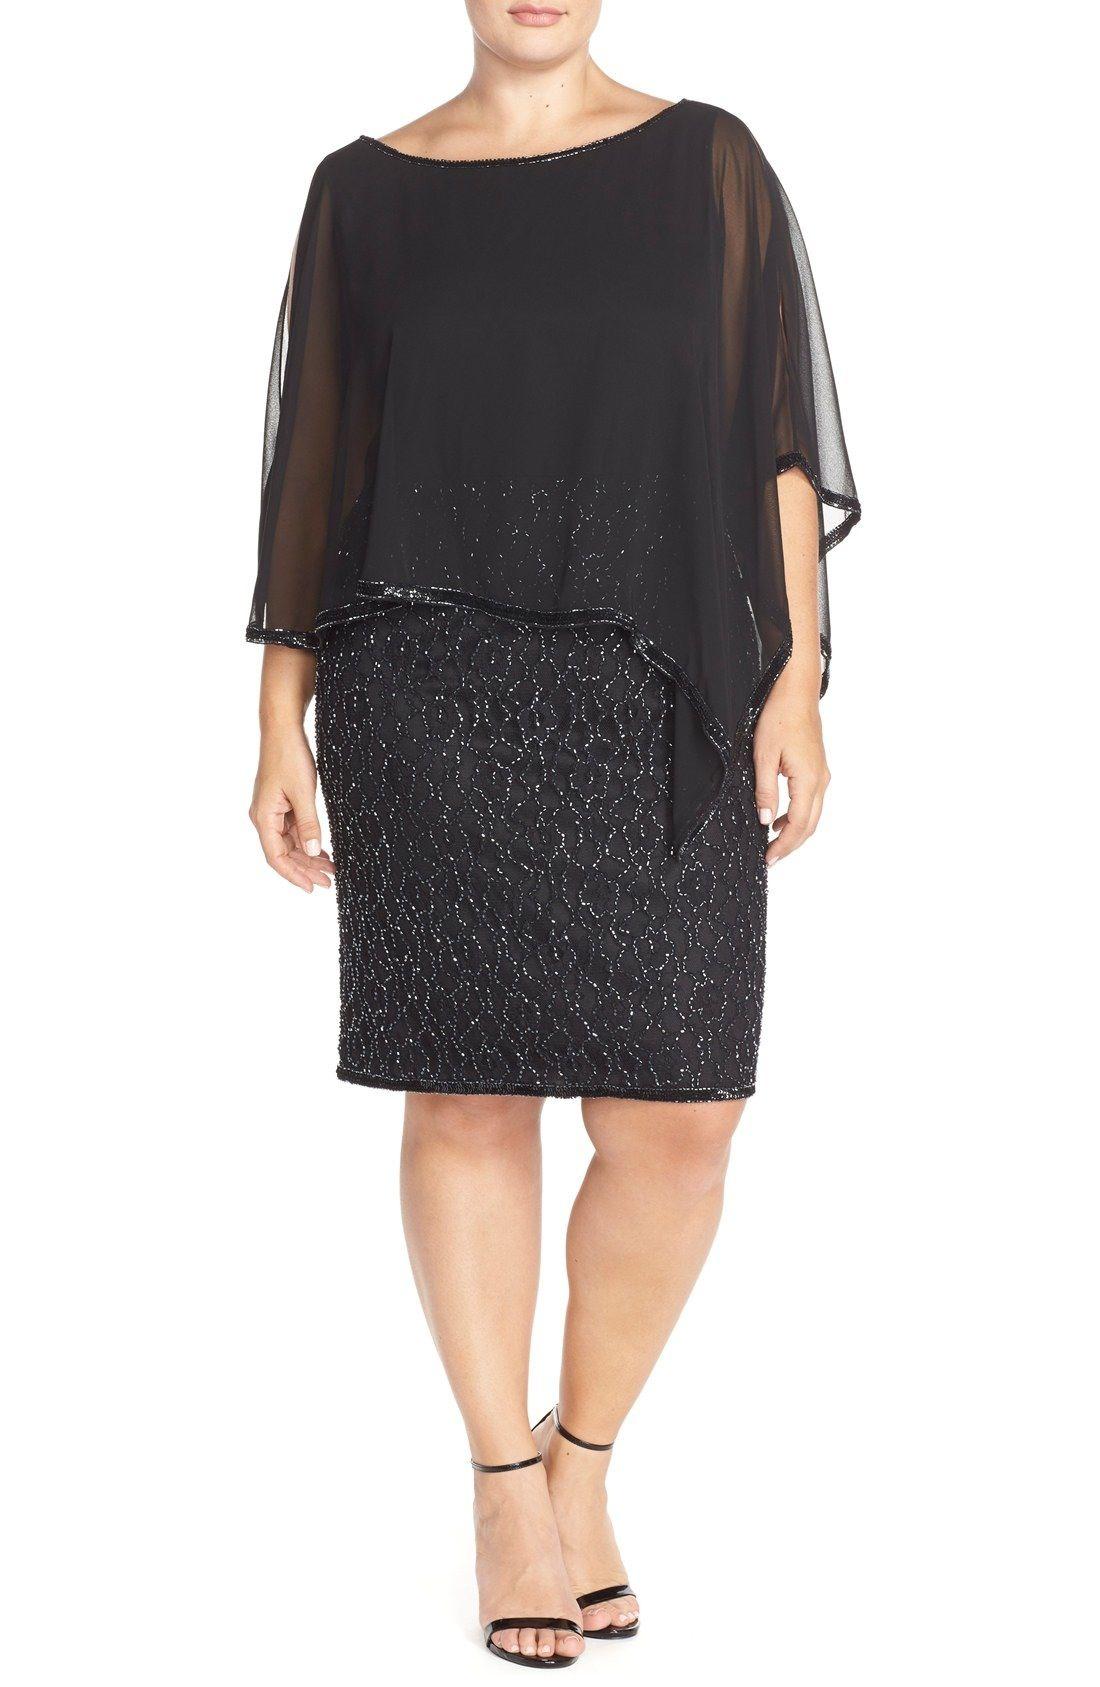 J Kara Chiffon Overlay Beaded Cocktail Dress Plus Size